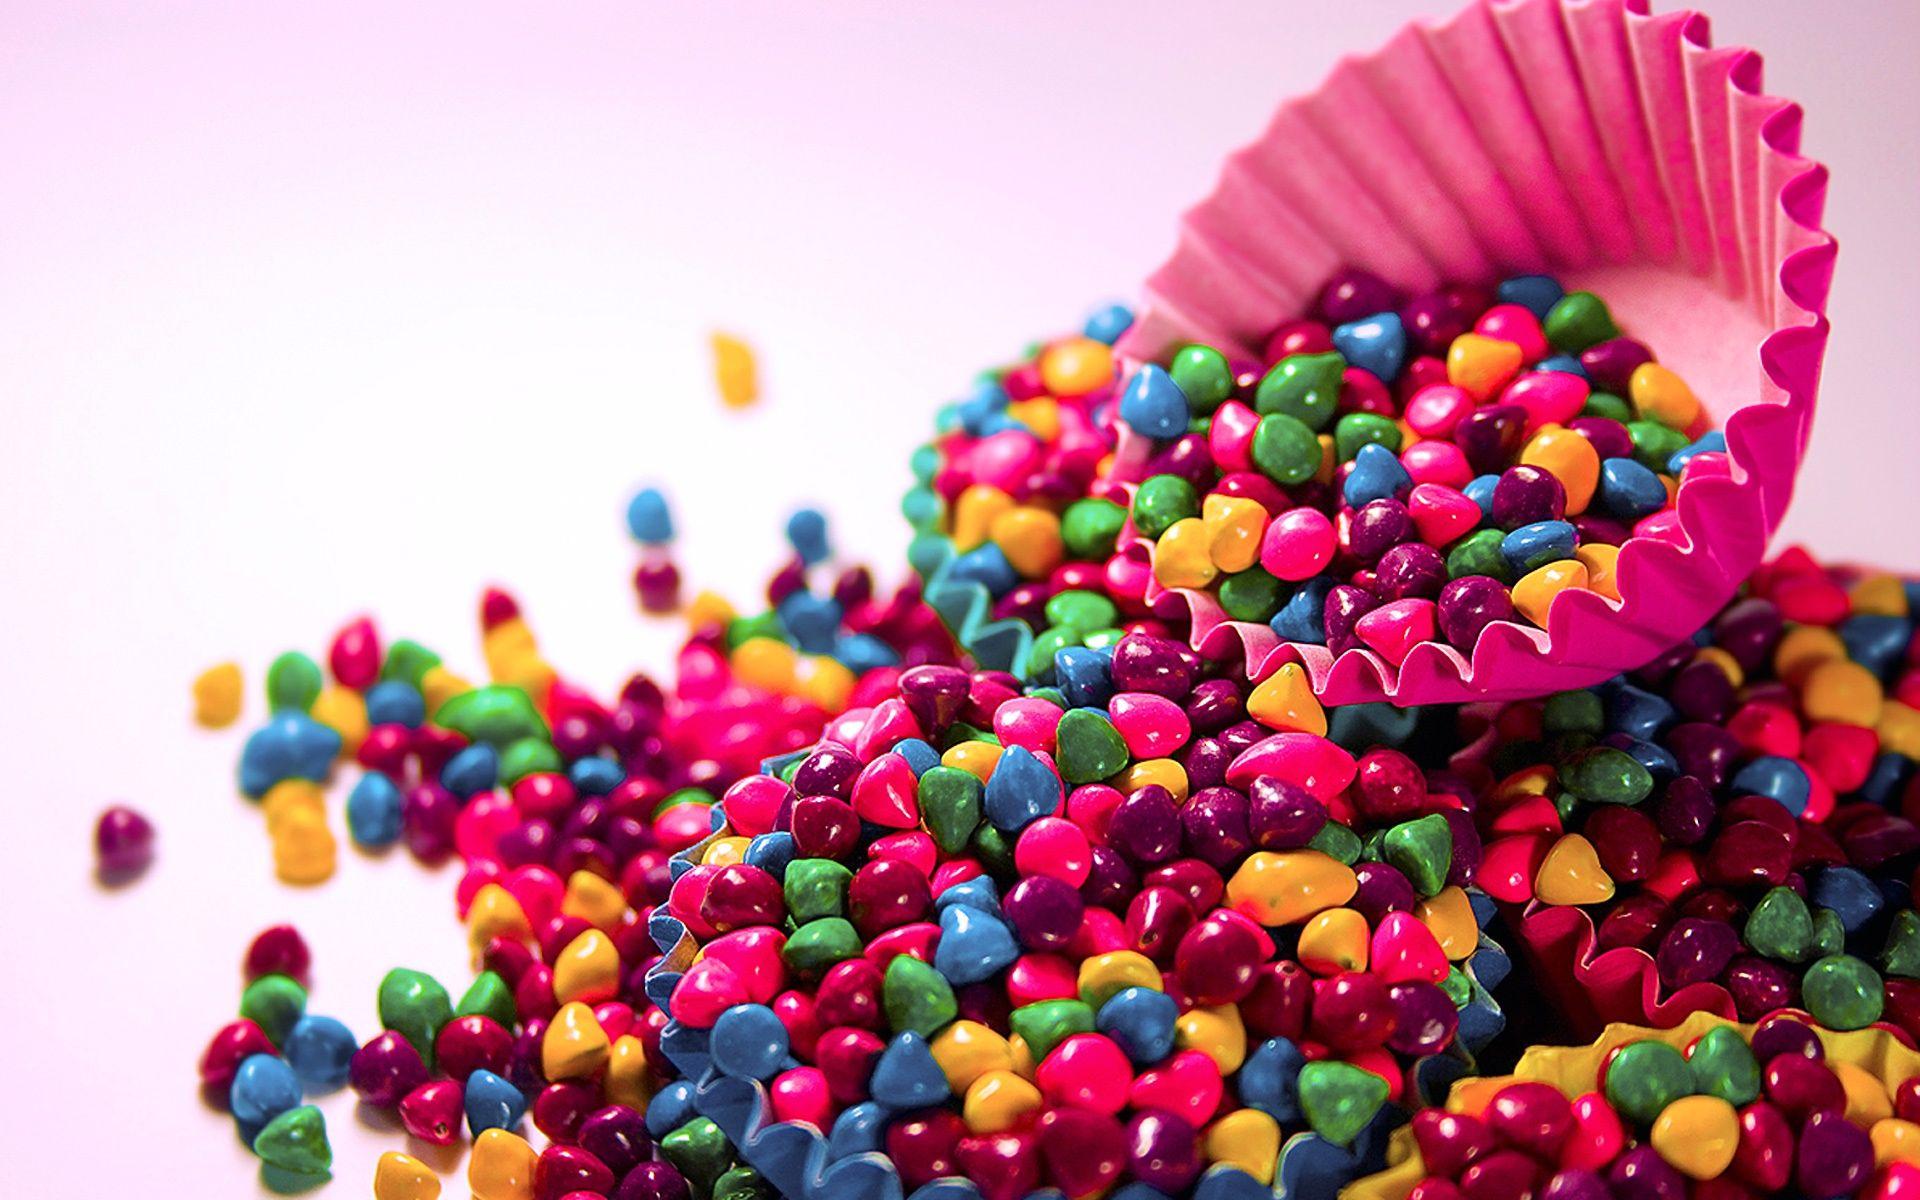 Colorful Candys Colorful Candy Colorful Pictures Rainbow Candy